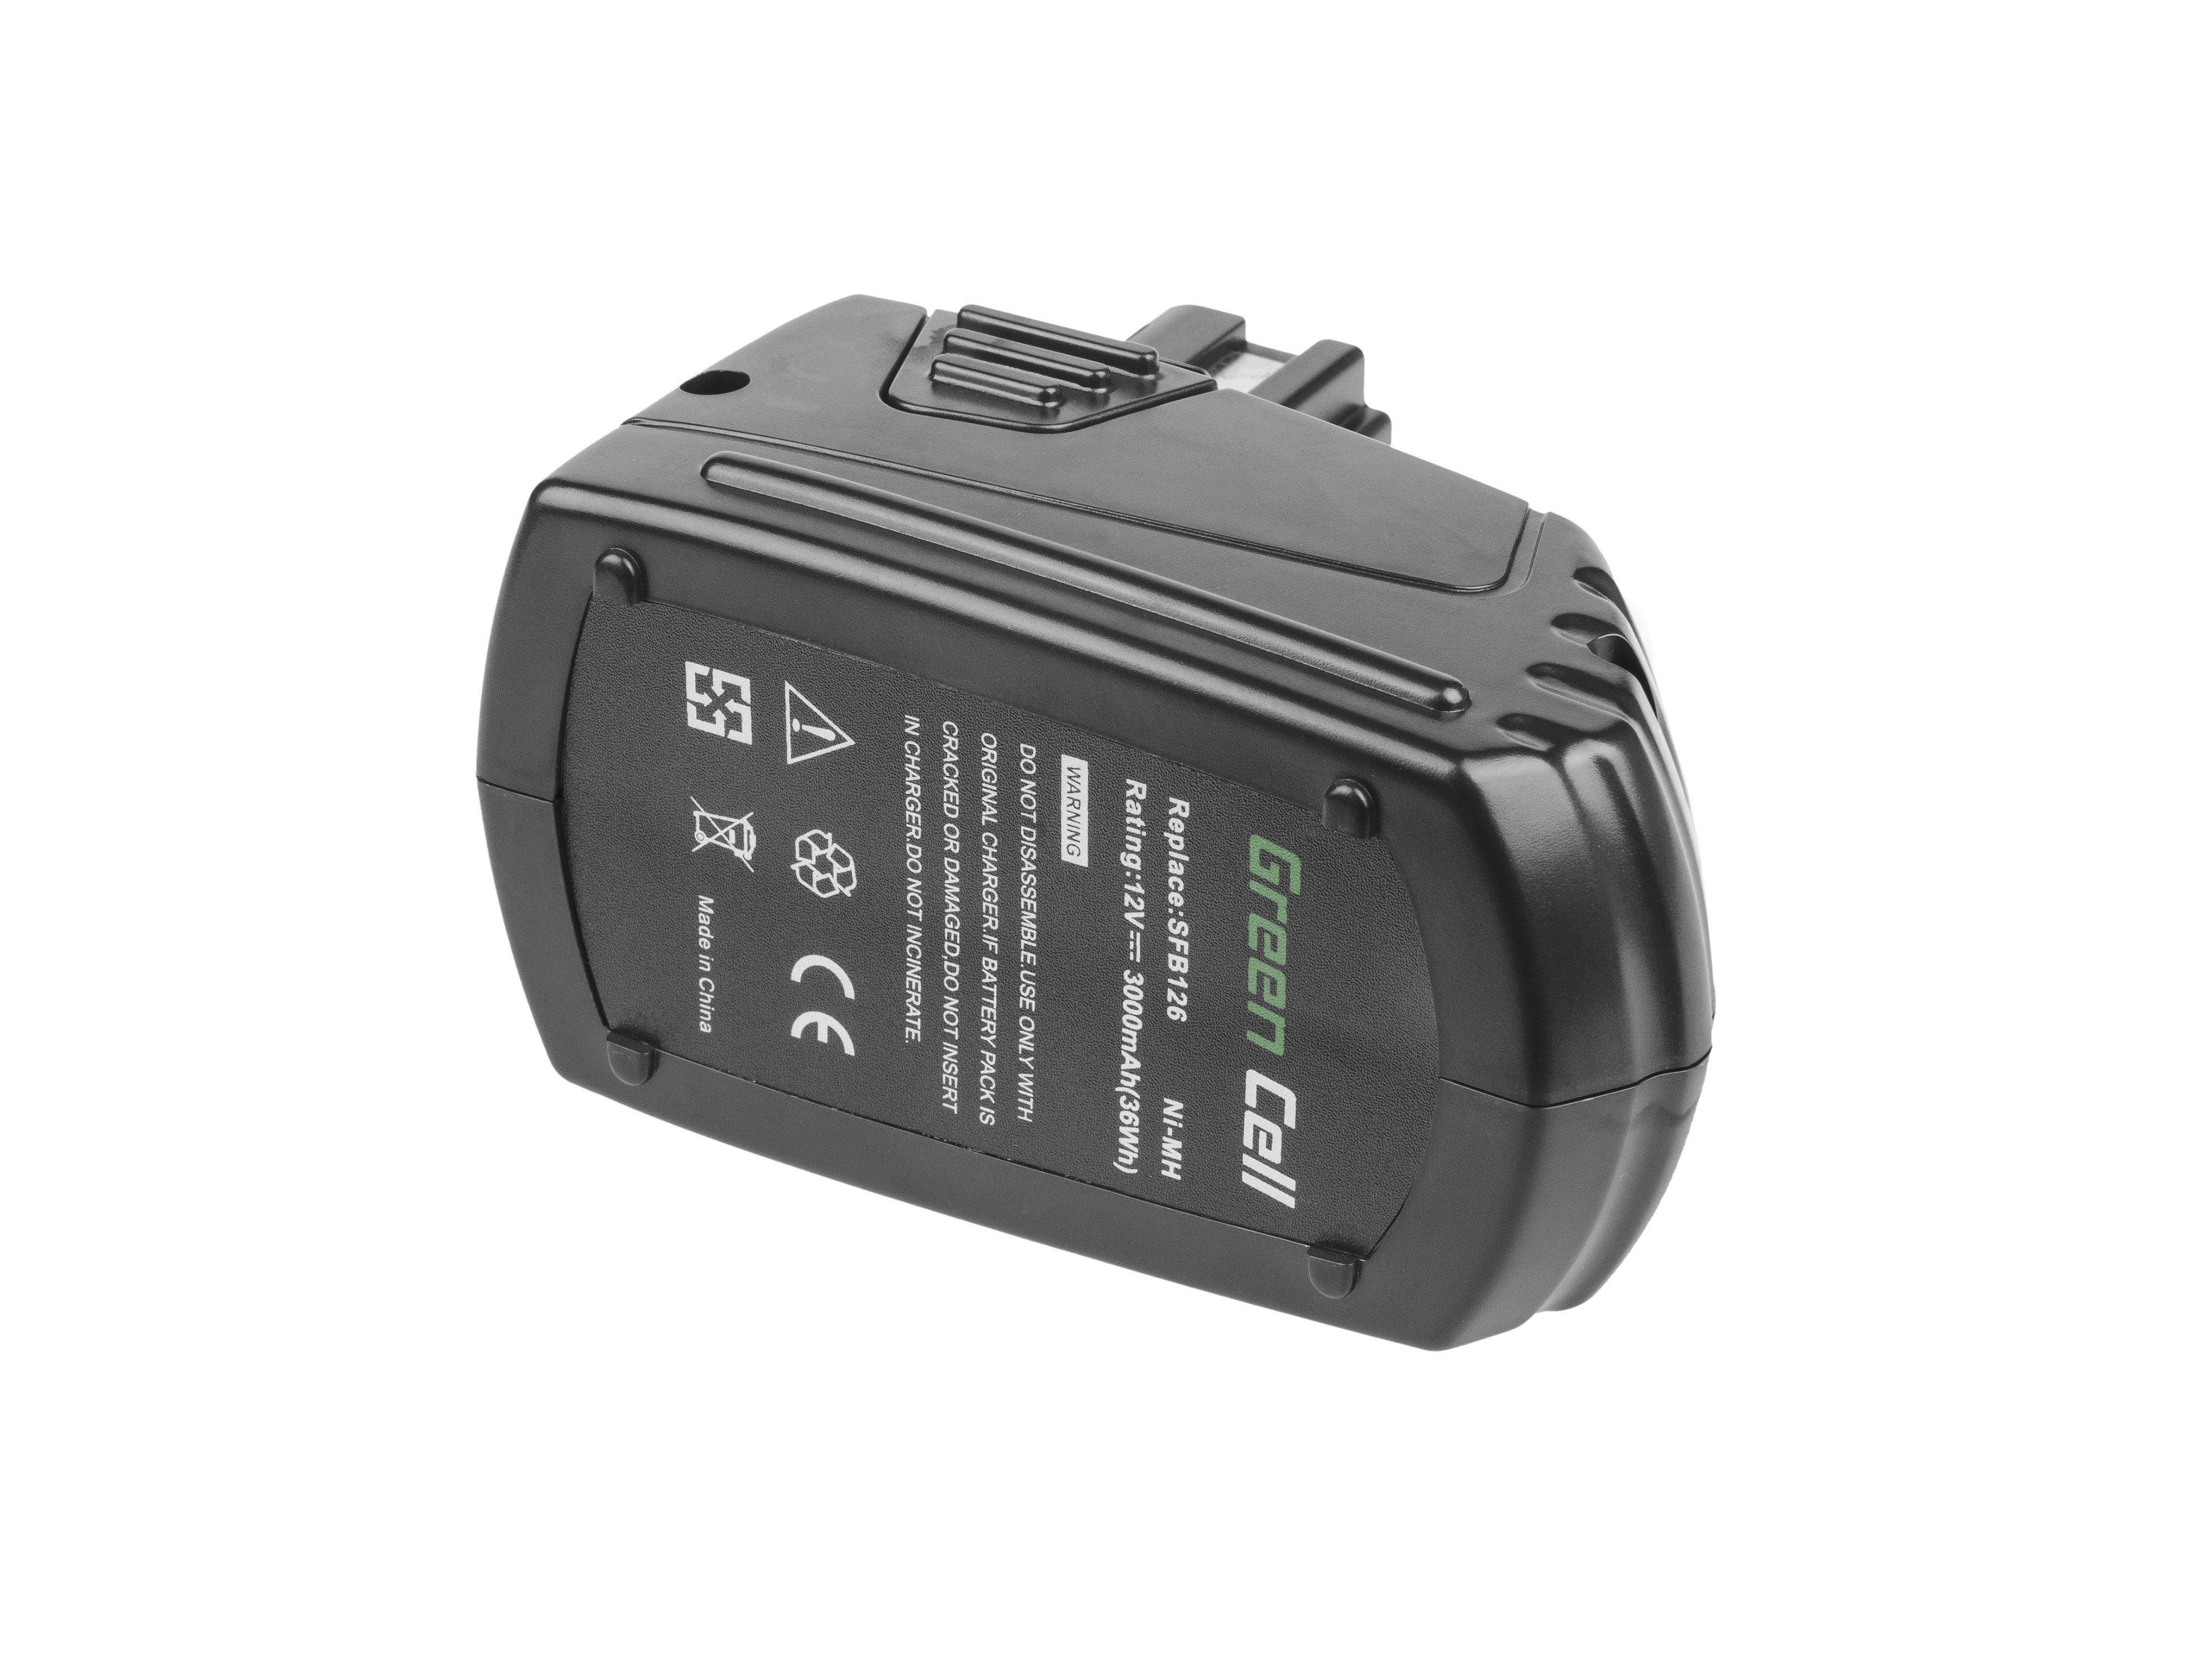 Green Cell PT153 Baterie Hilti SFB 121 SFB 126,Hilti SF 121-A SFL 12/15 SID 121-A 3000mAh Ni-MH – neoriginální